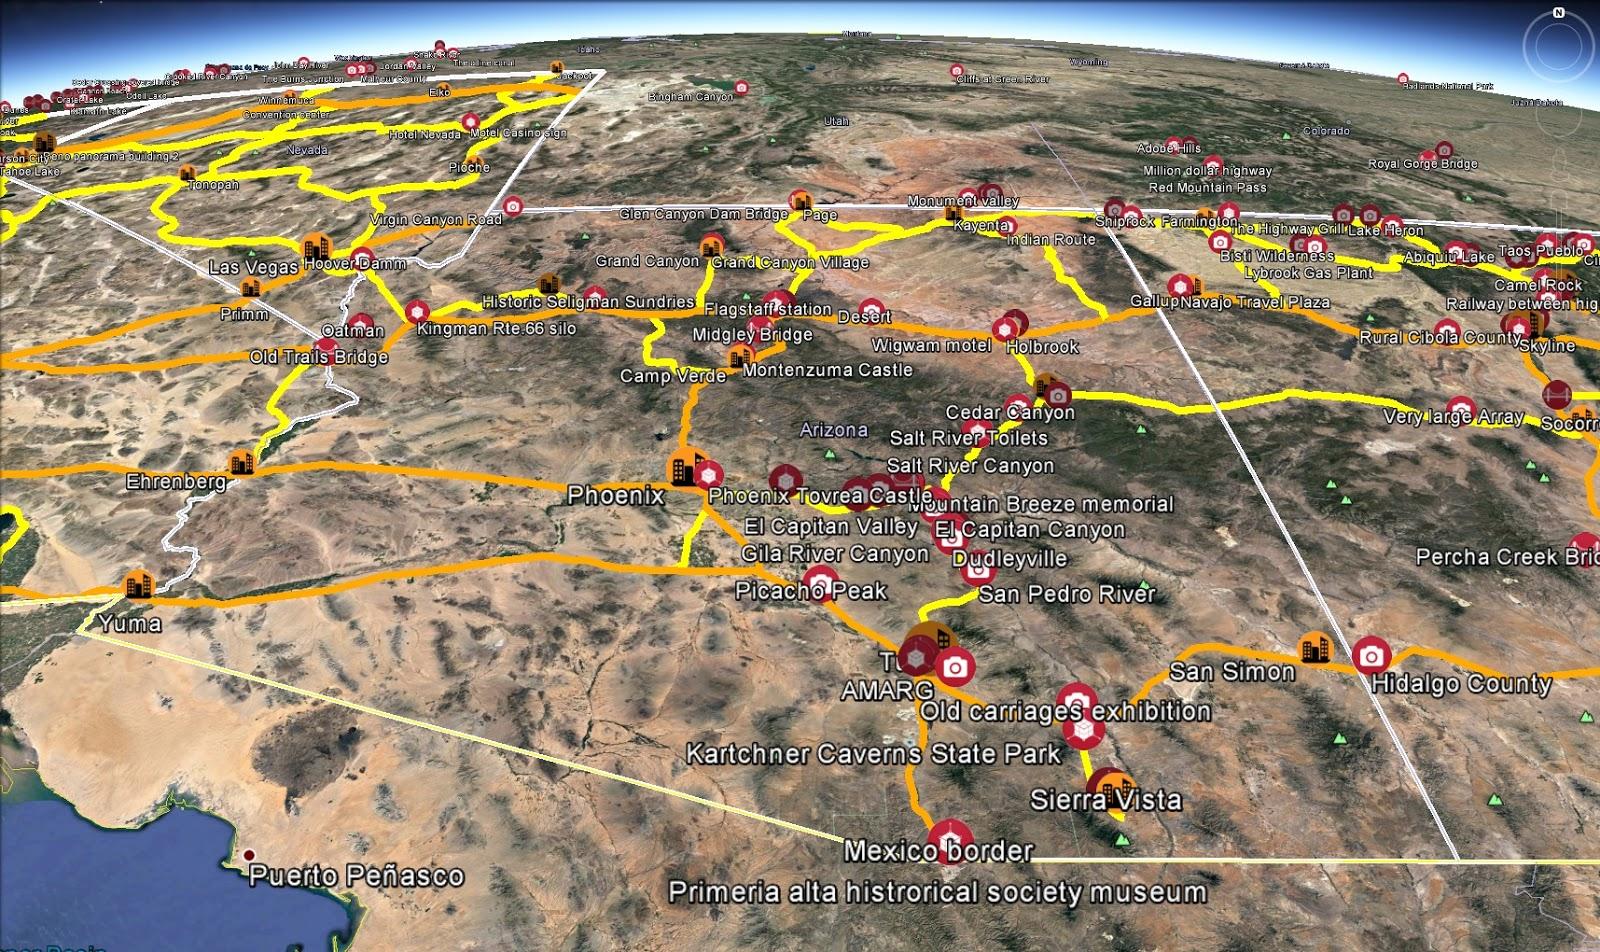 Arizona+Research+Googleearth.jpg